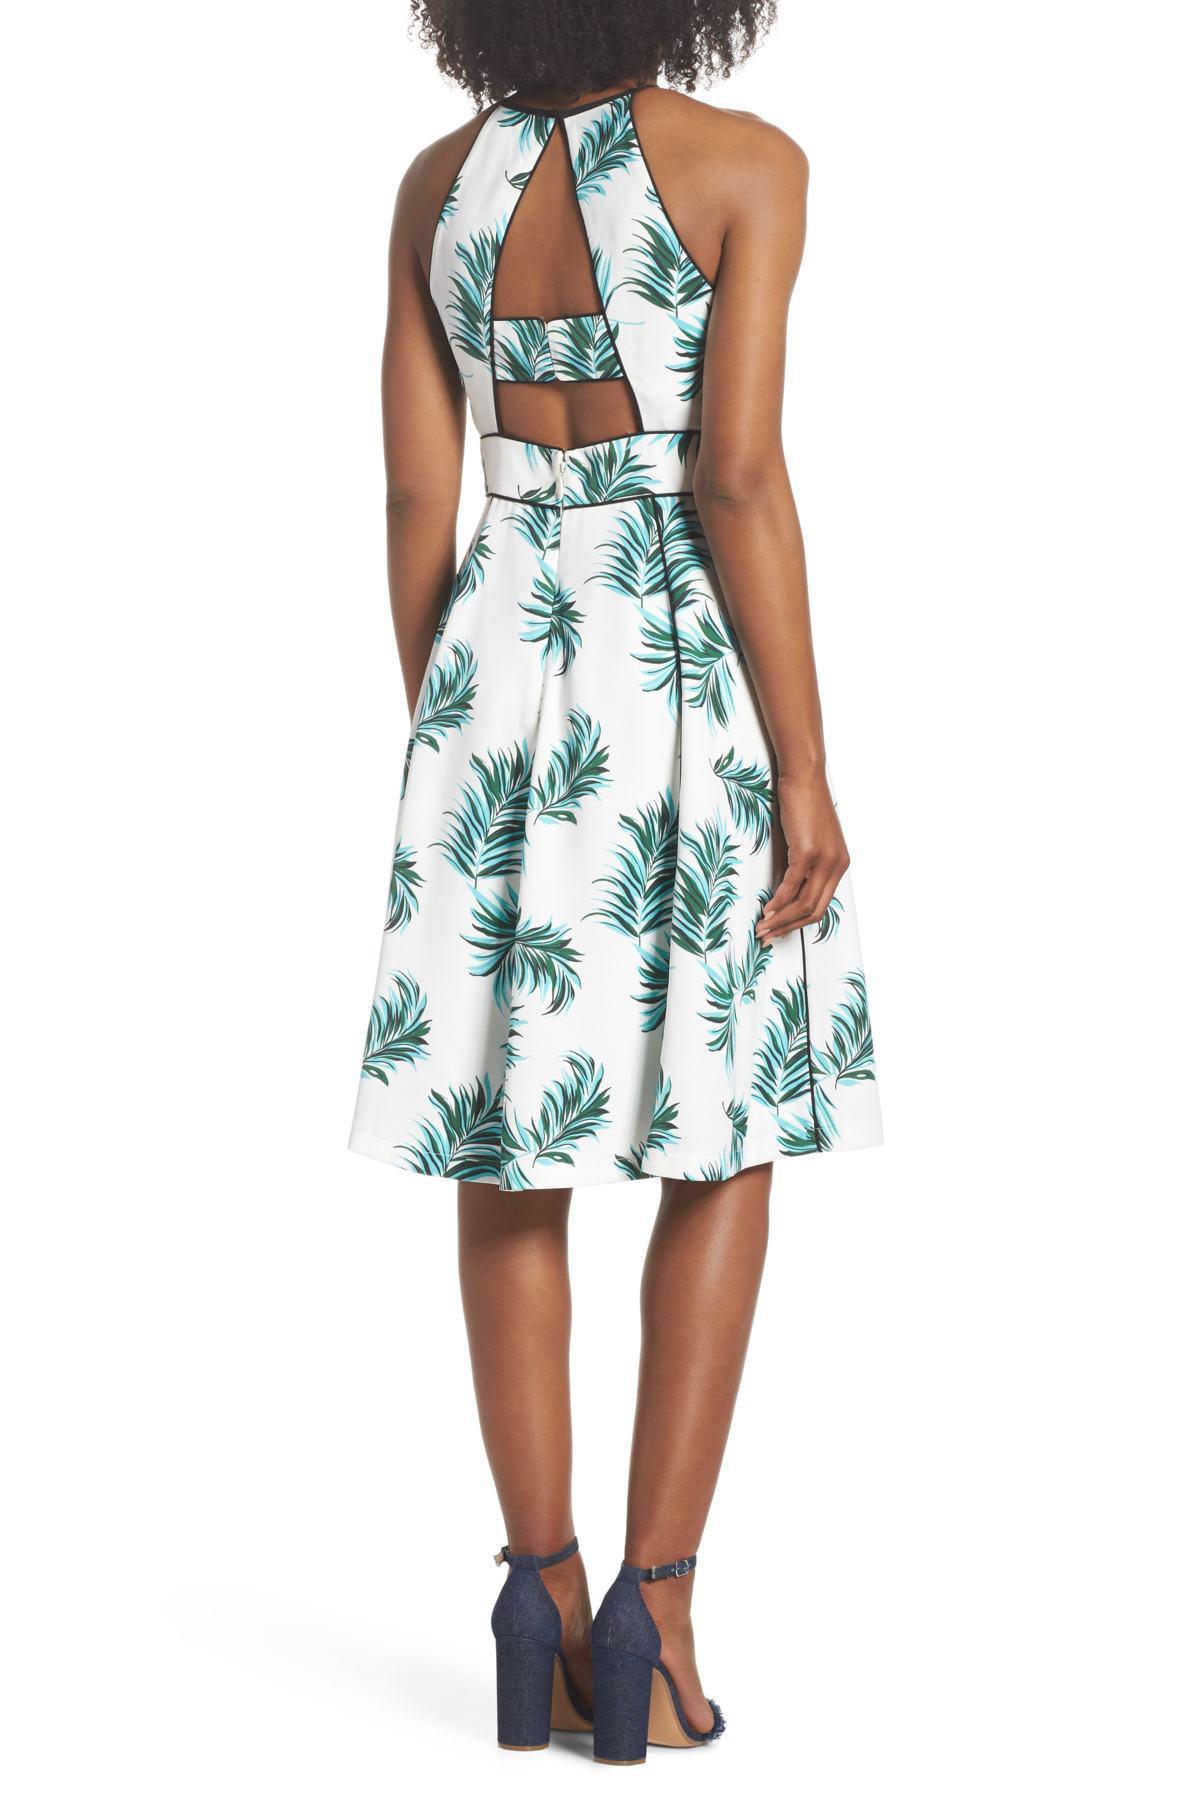 10dc0cec1d95 Adelyn Rae - White Mina Print Fit & Flare Halter Dress - Lyst. View  fullscreen